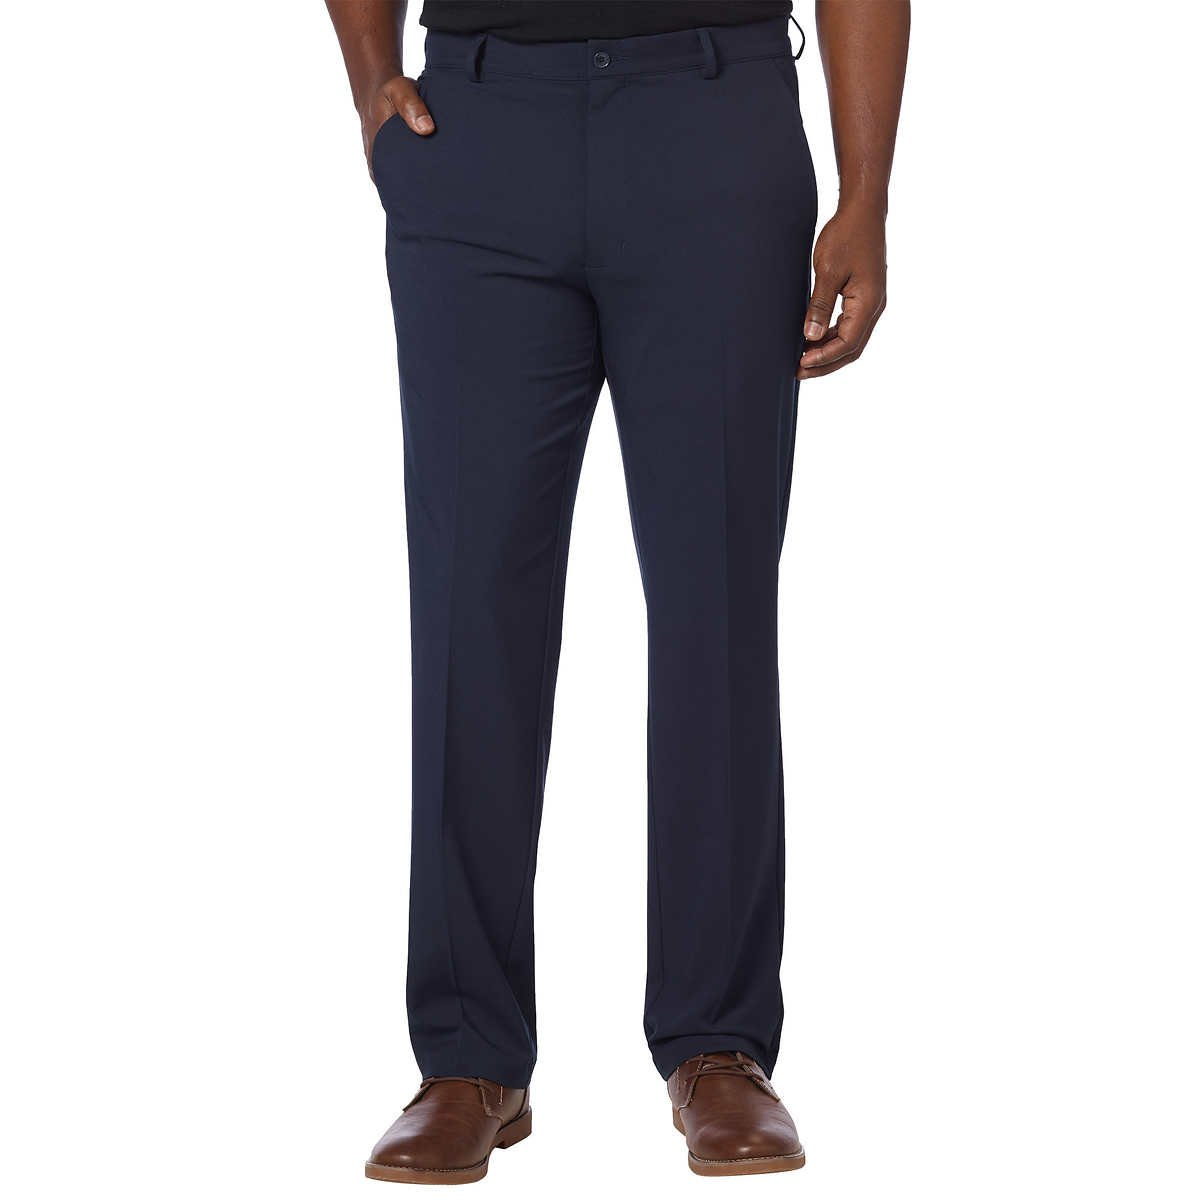 Greg Norman Mens ML75 Ultimate Travel Golf Pants (34W x 34L, Navy)